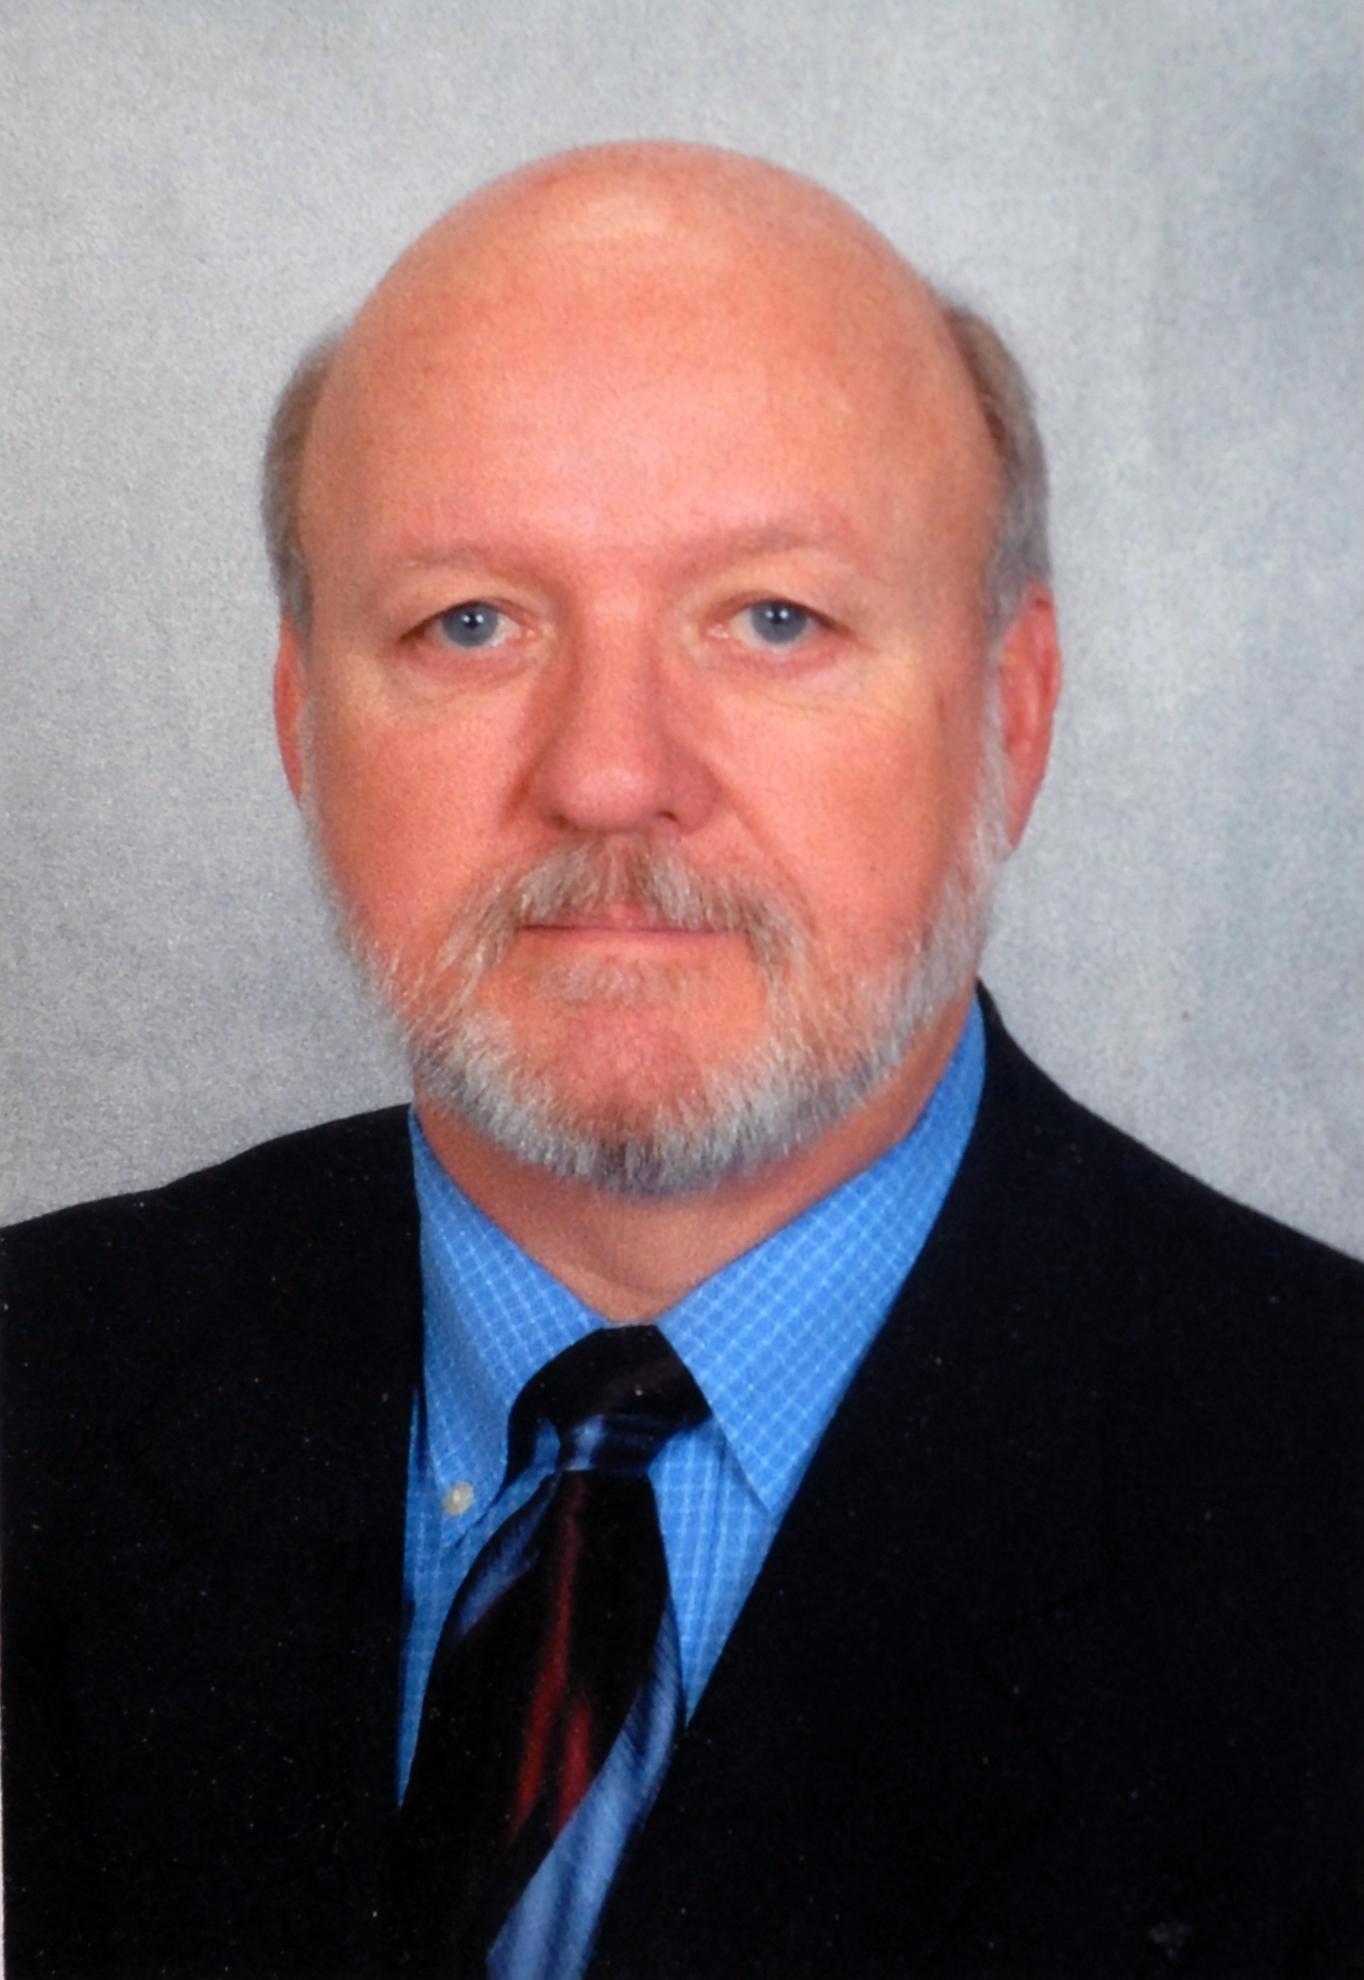 Martin VanMeter